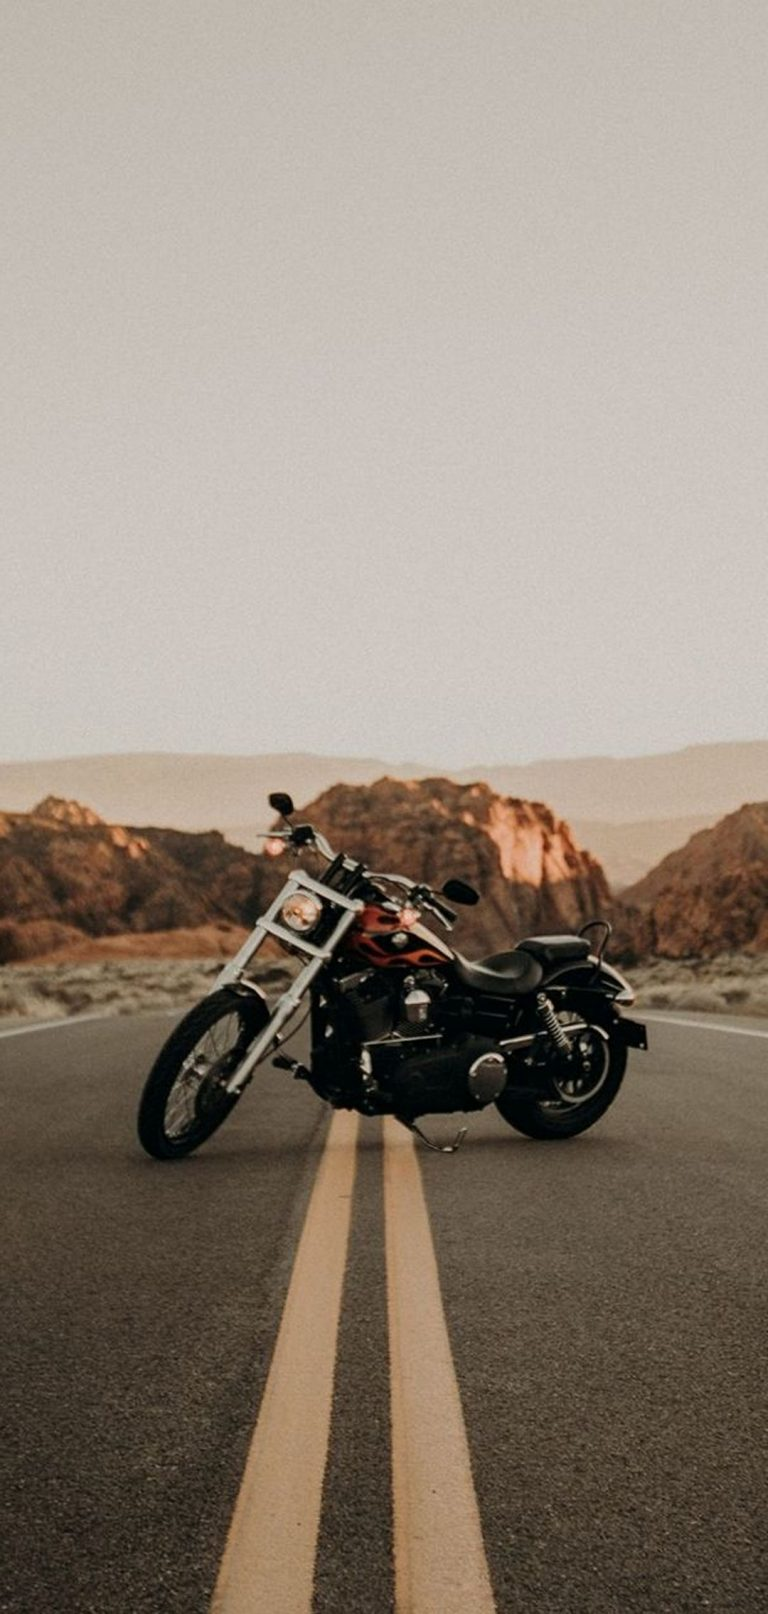 Marking Motorcycle 1080x2270 768x1614